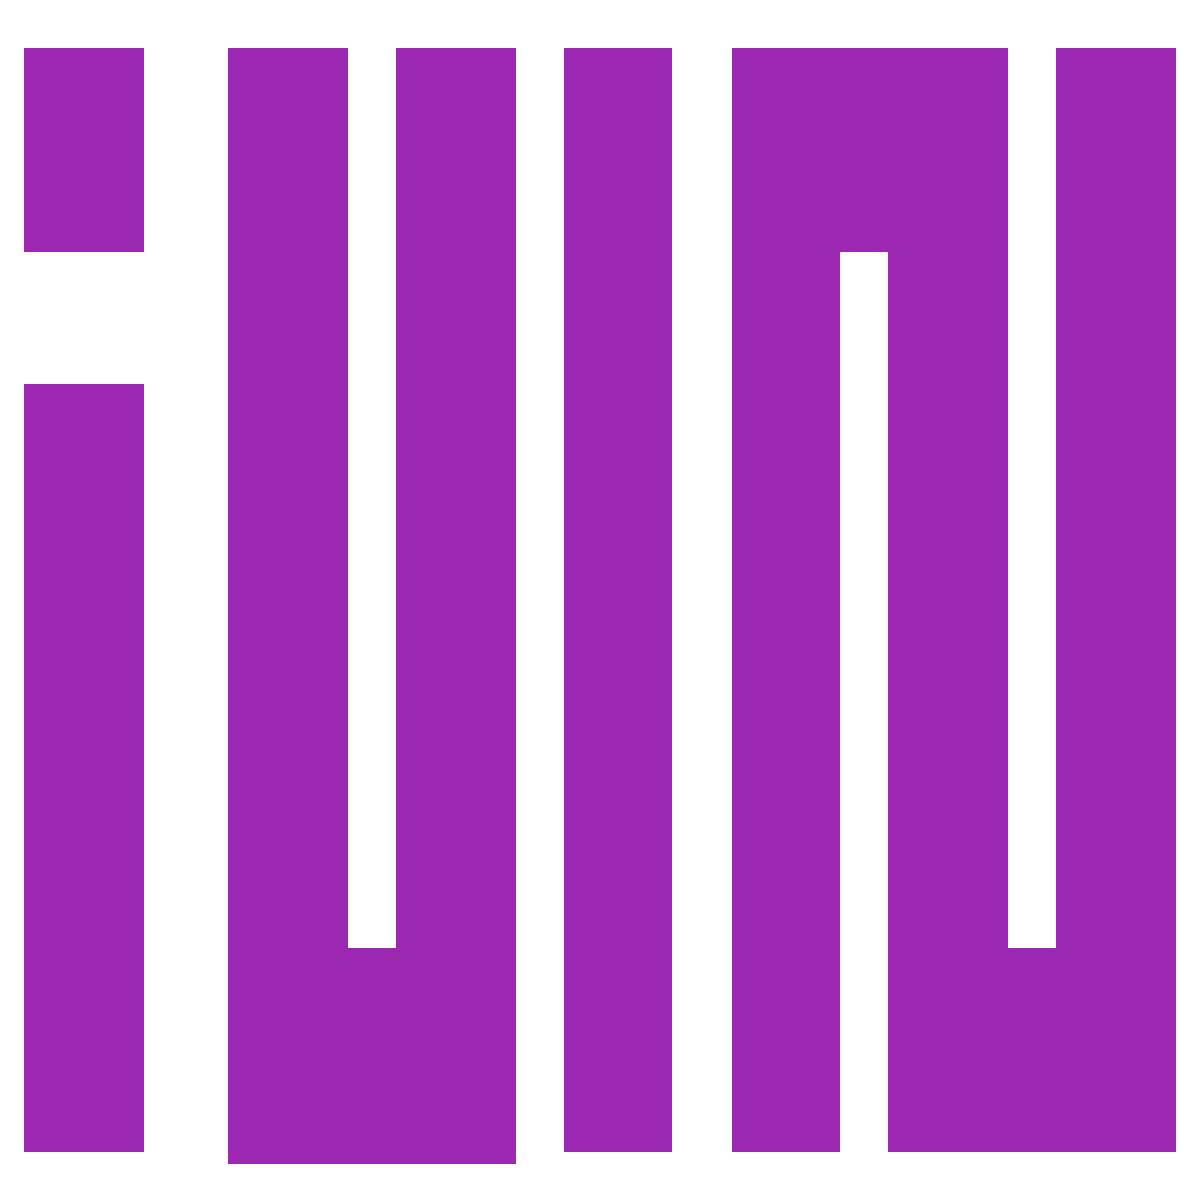 G-IDLE